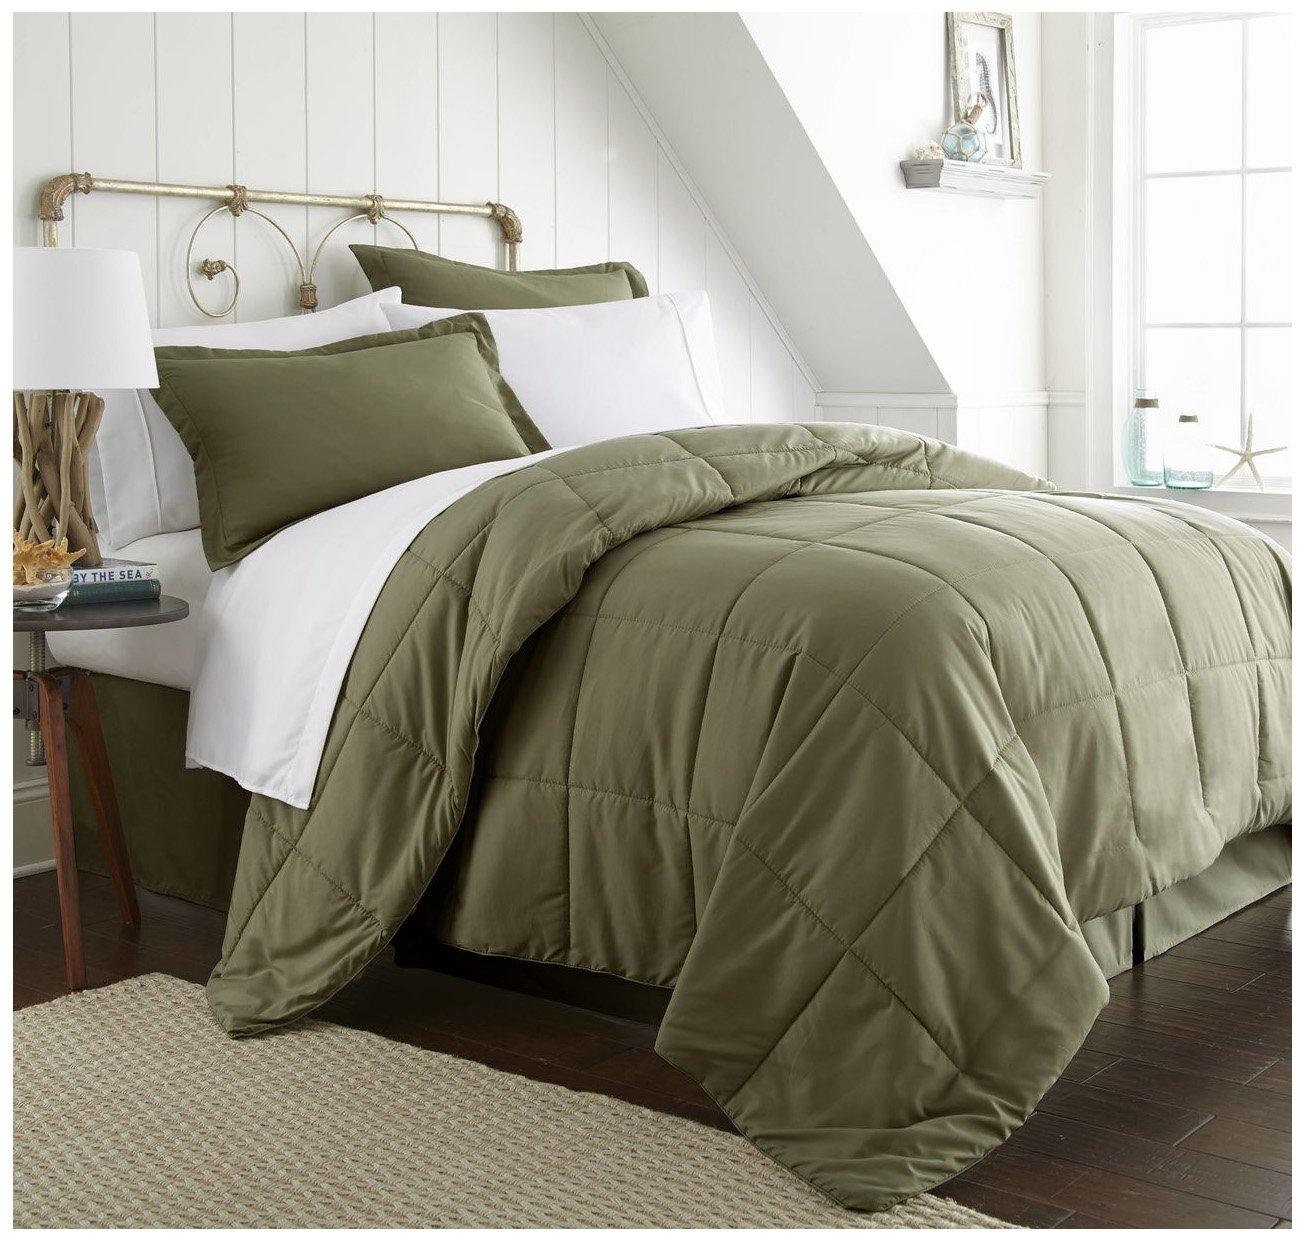 ienjoy Home Bed in a Bag, Queen, Sage